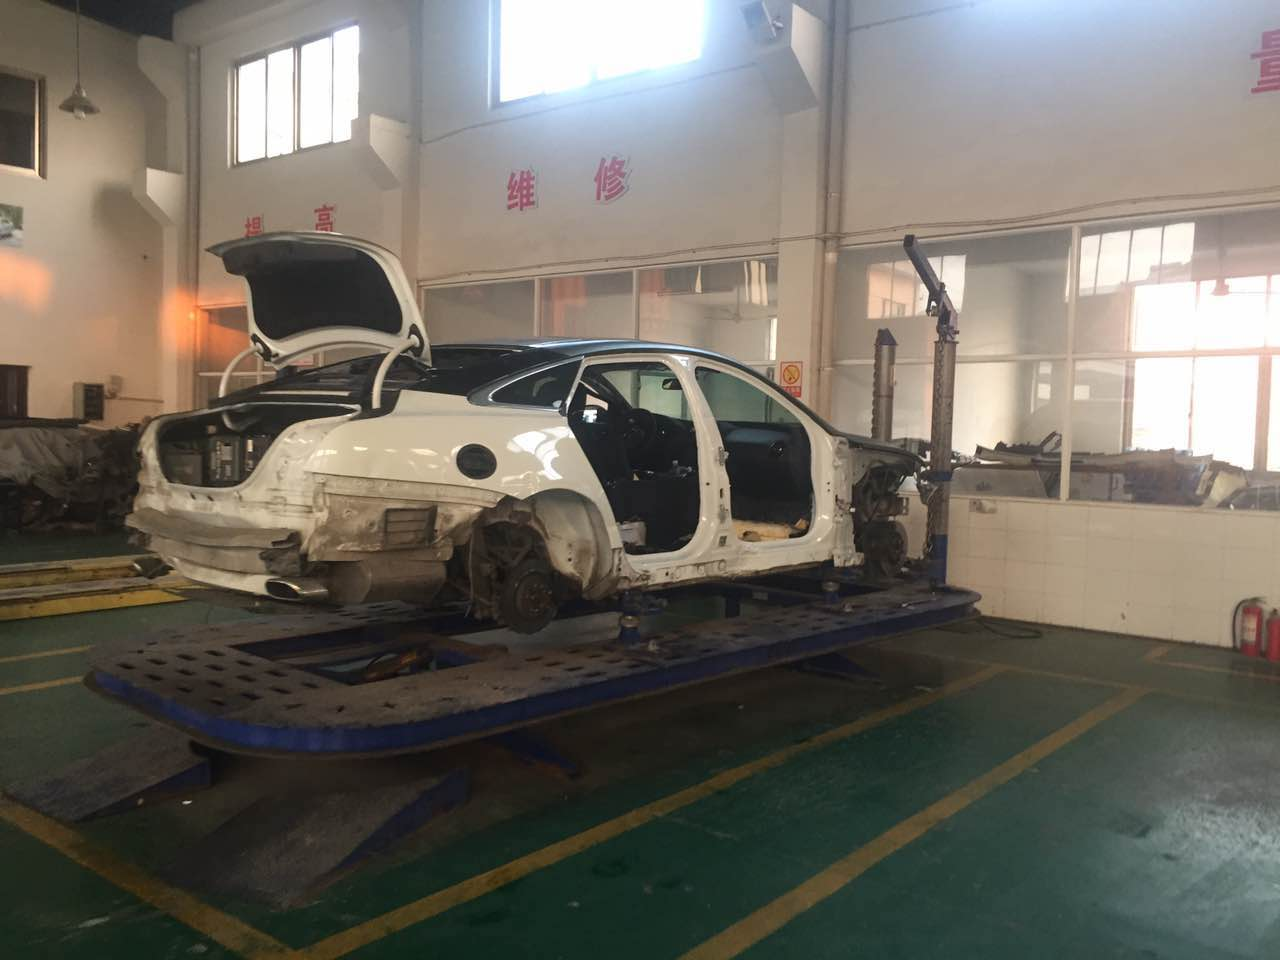 B30S auto body collision repair systemframe machine